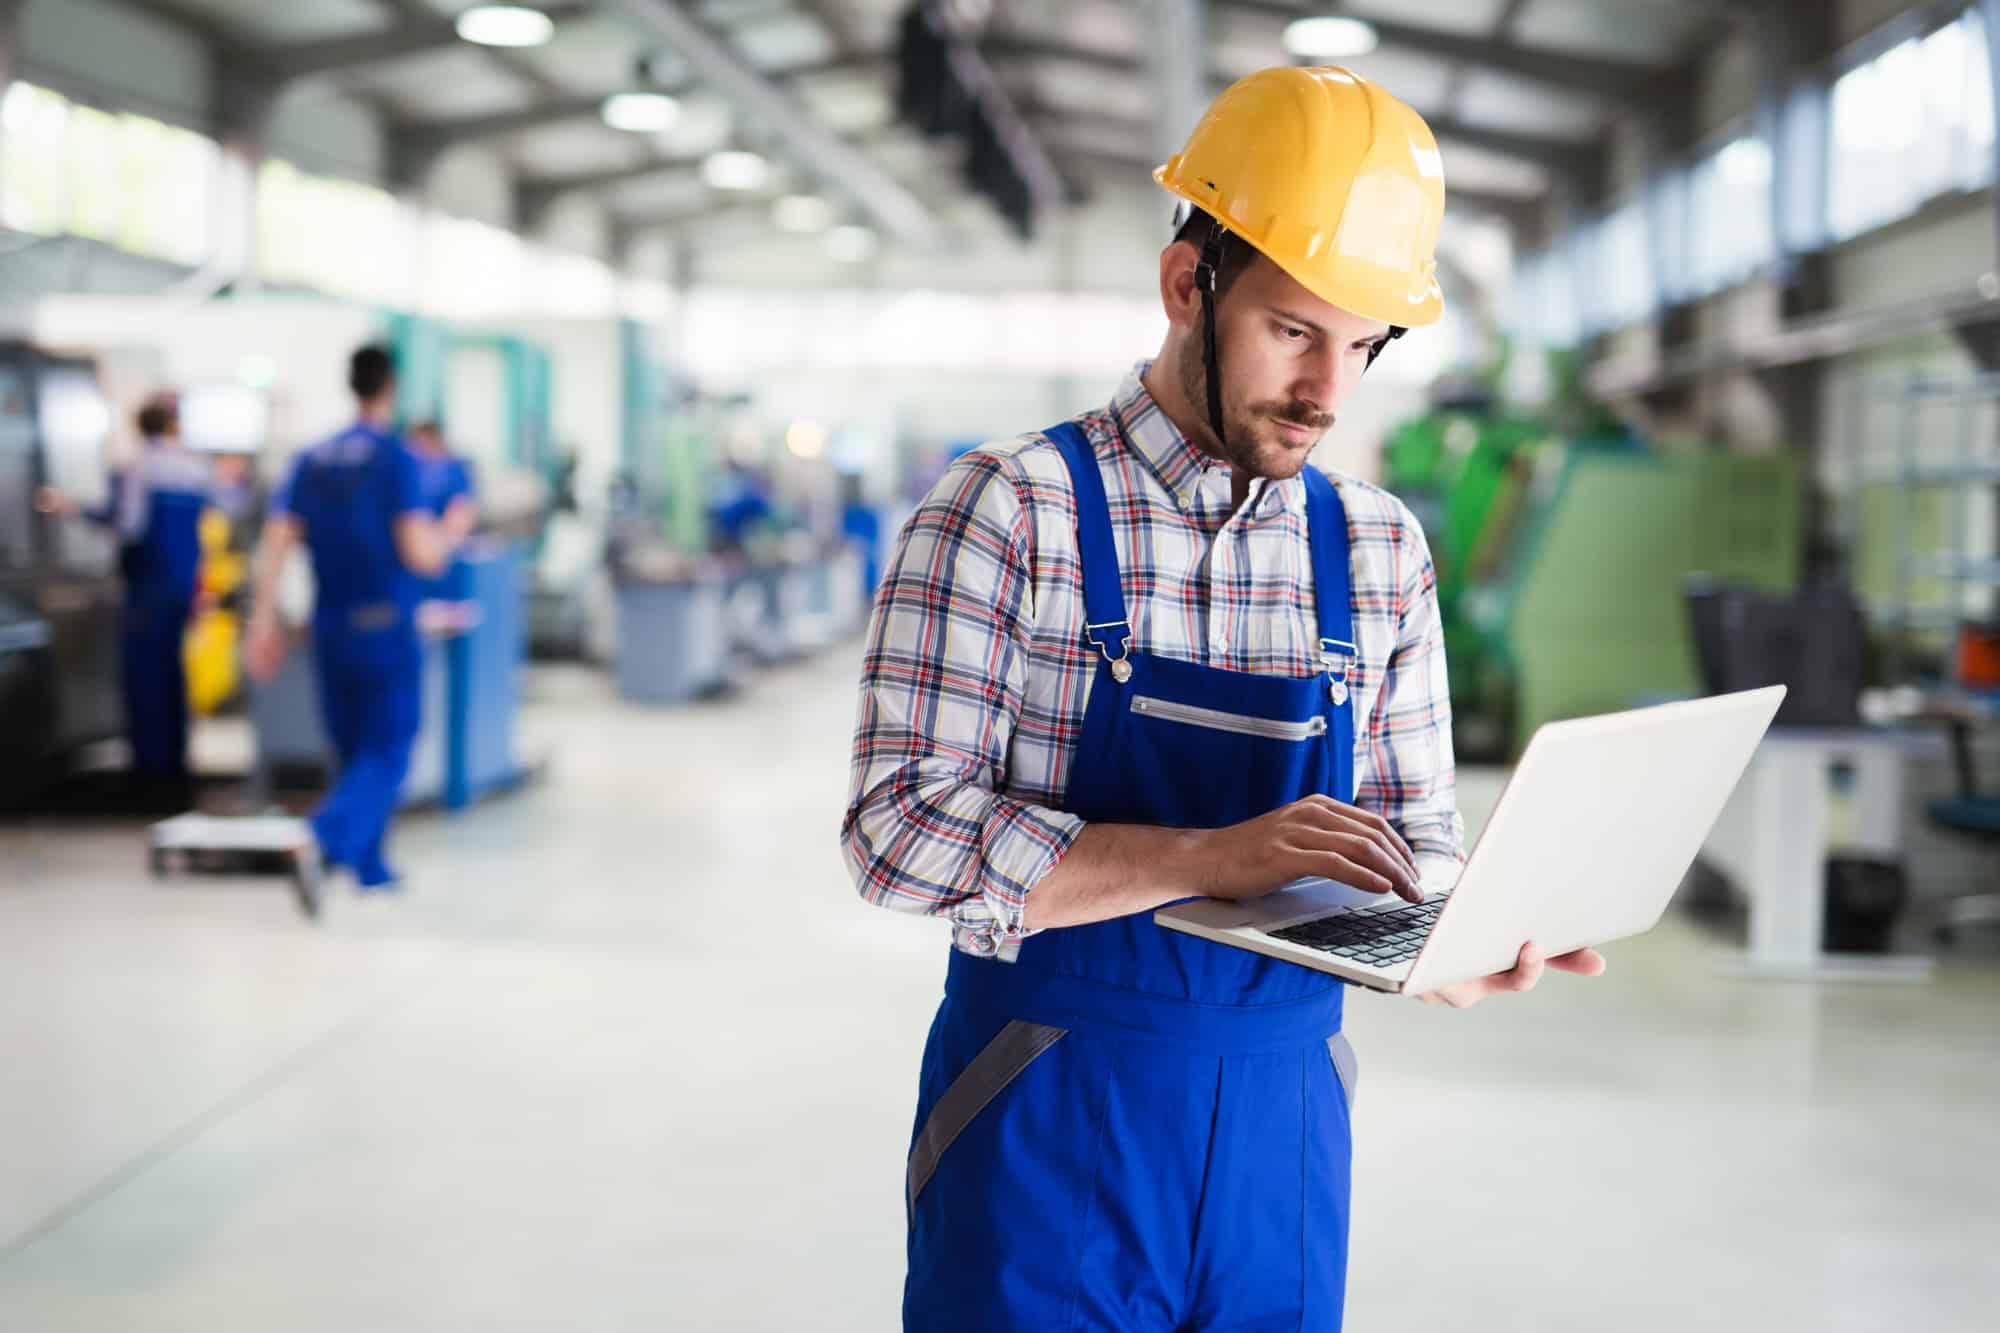 Berufe-Kunststoffverarbeitende-Industrie